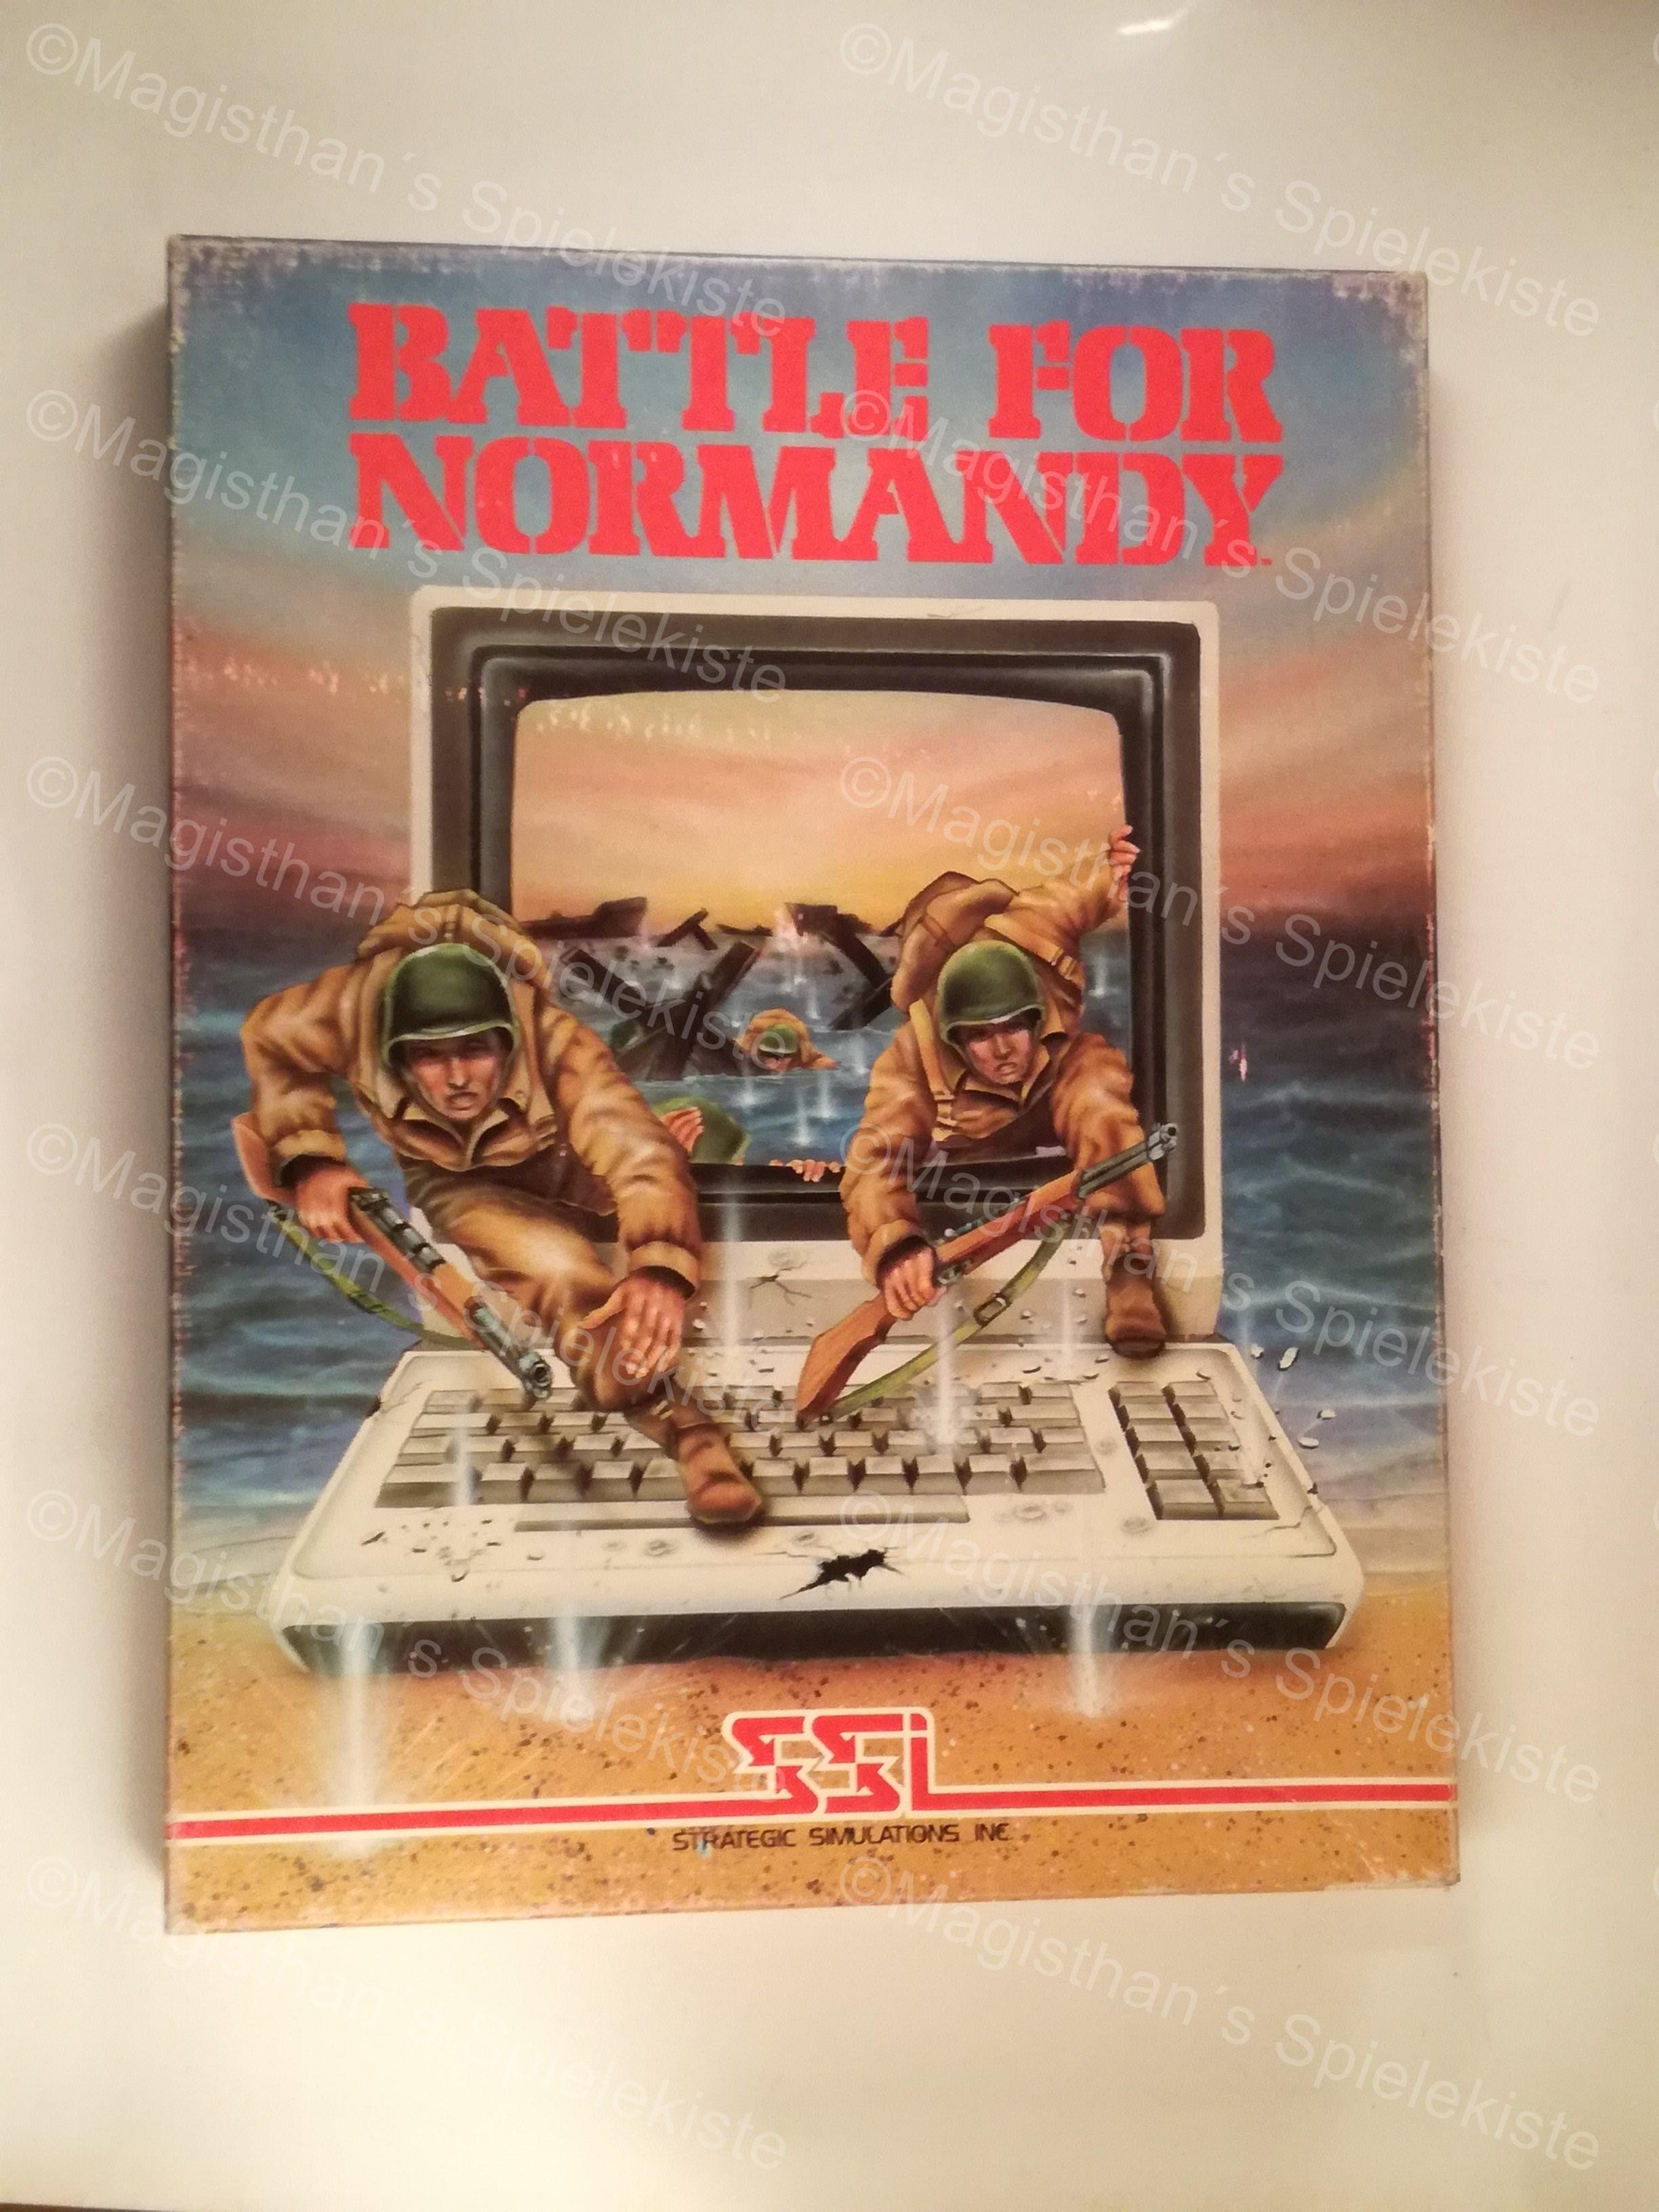 BattleforNormandyTSR1.jpg